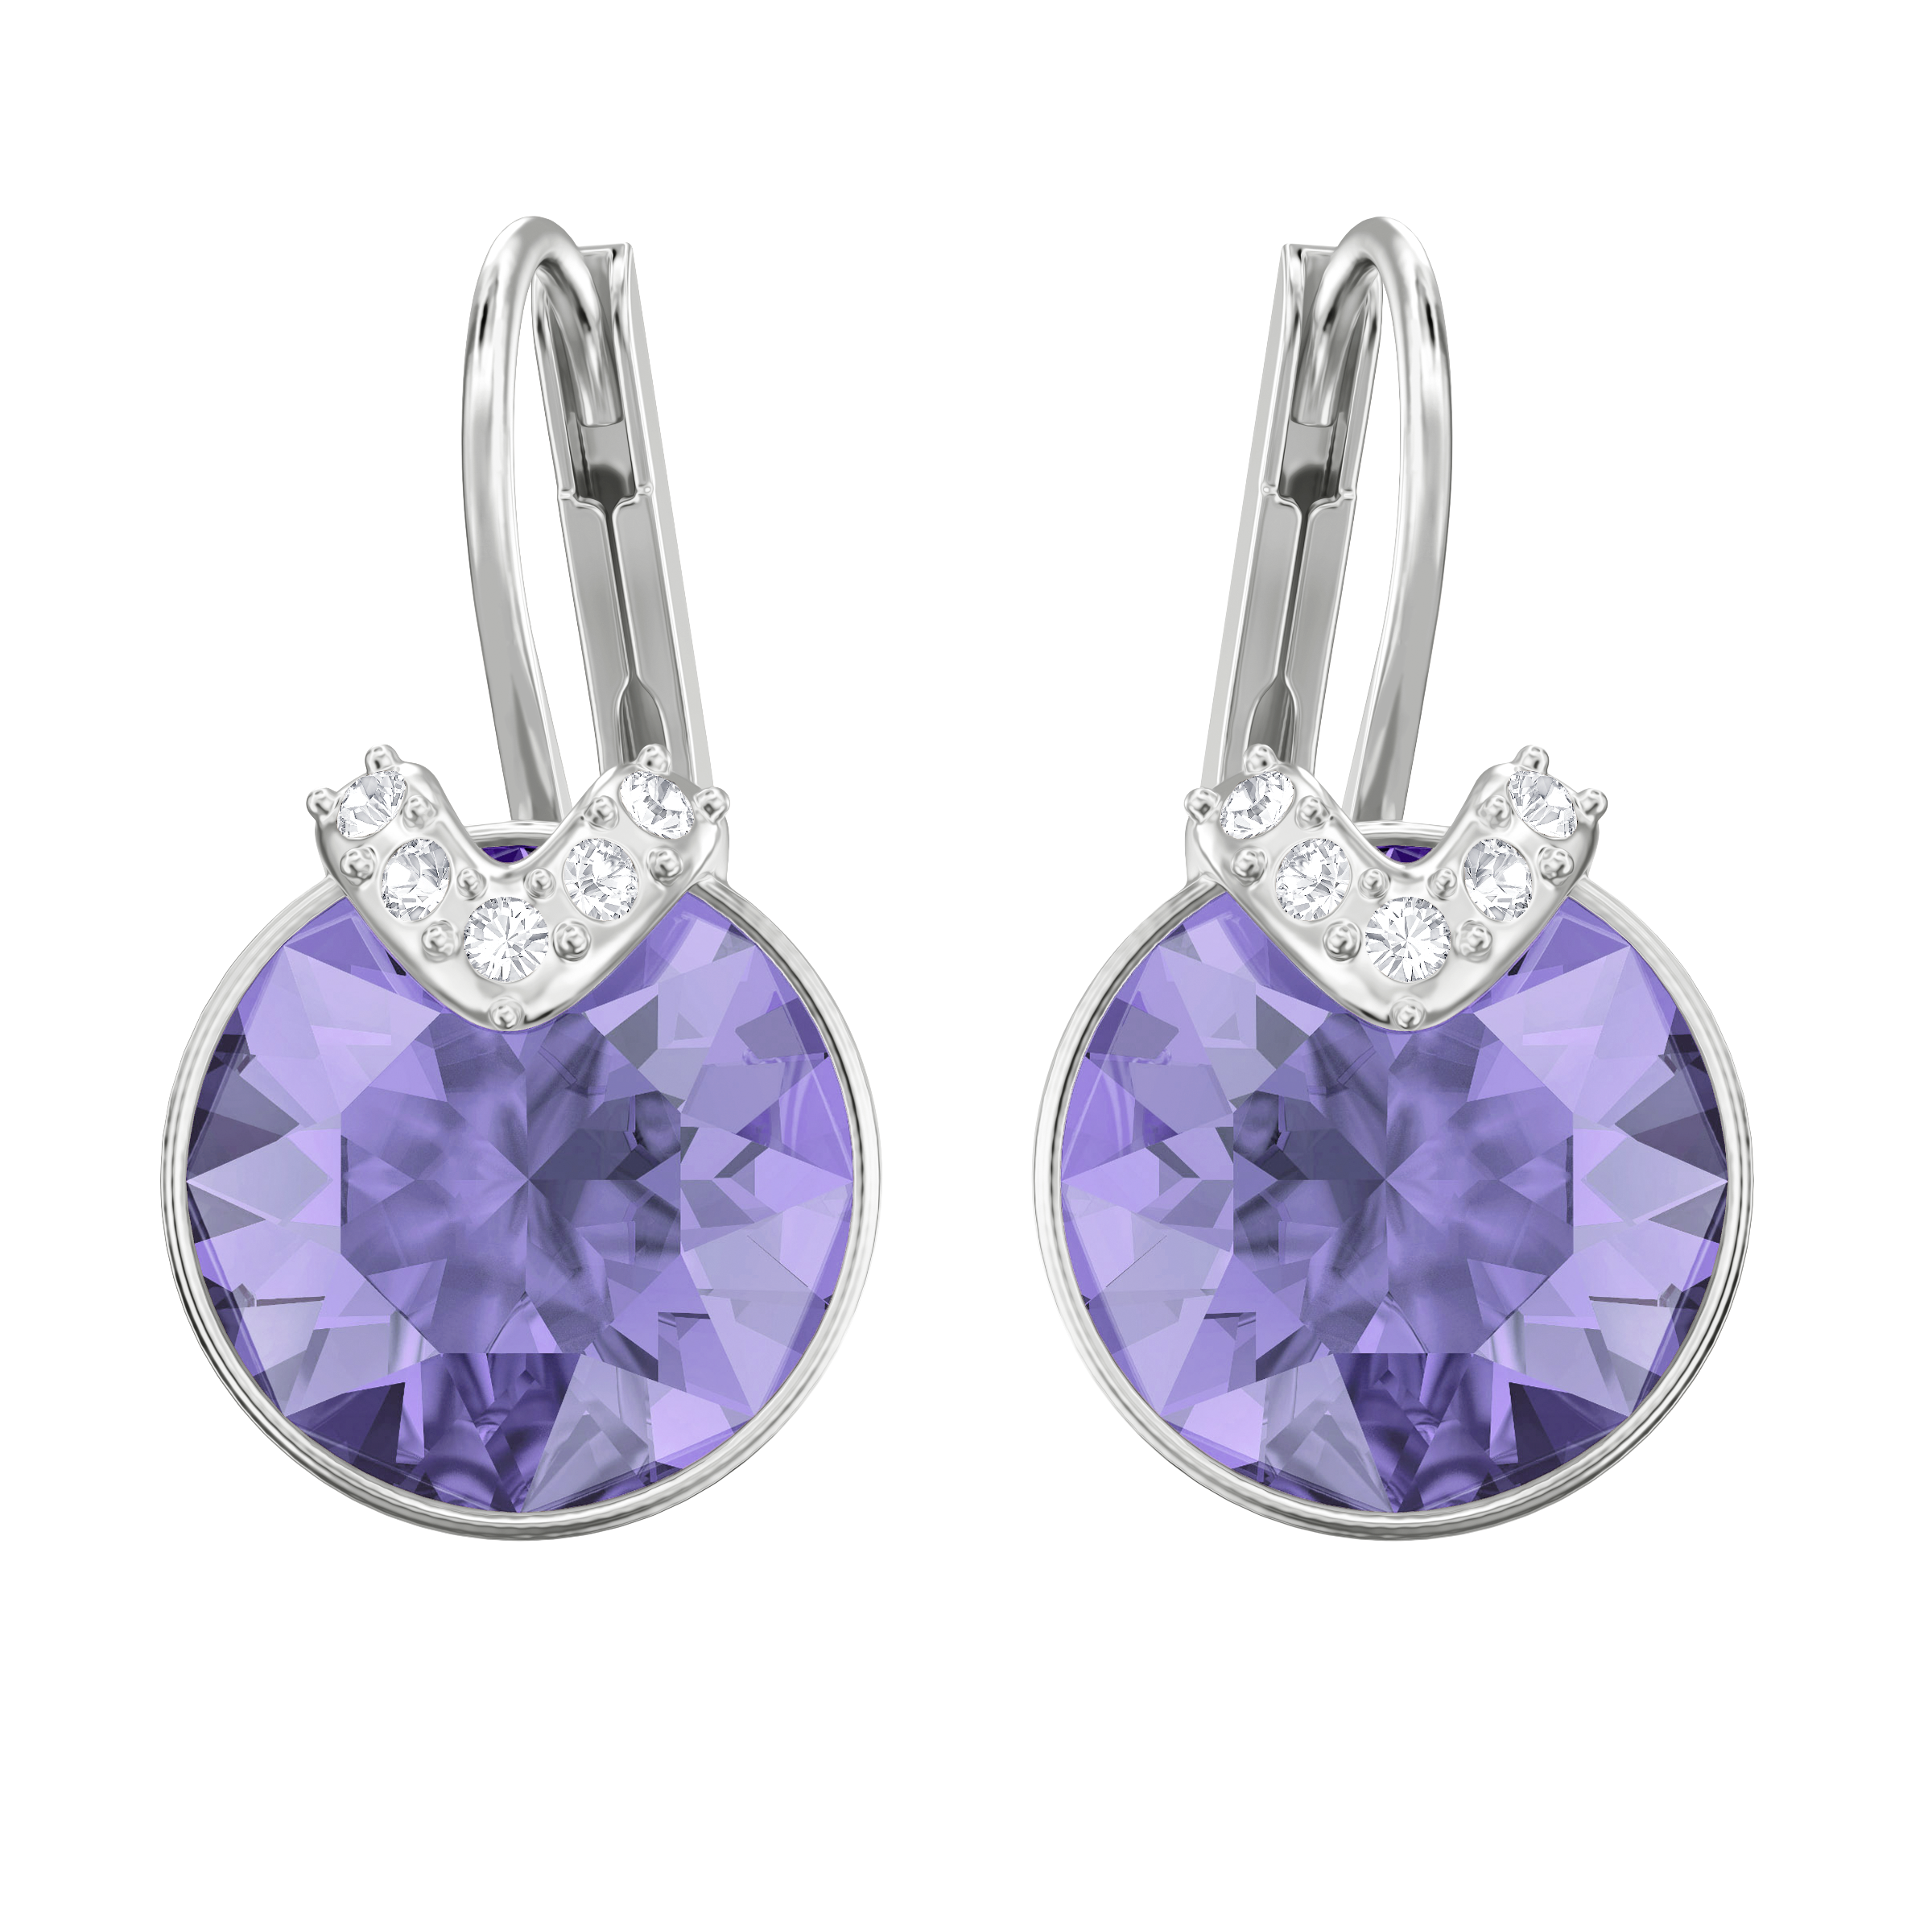 Bella V Pierced Earrings, Violet, Rhodium Plating